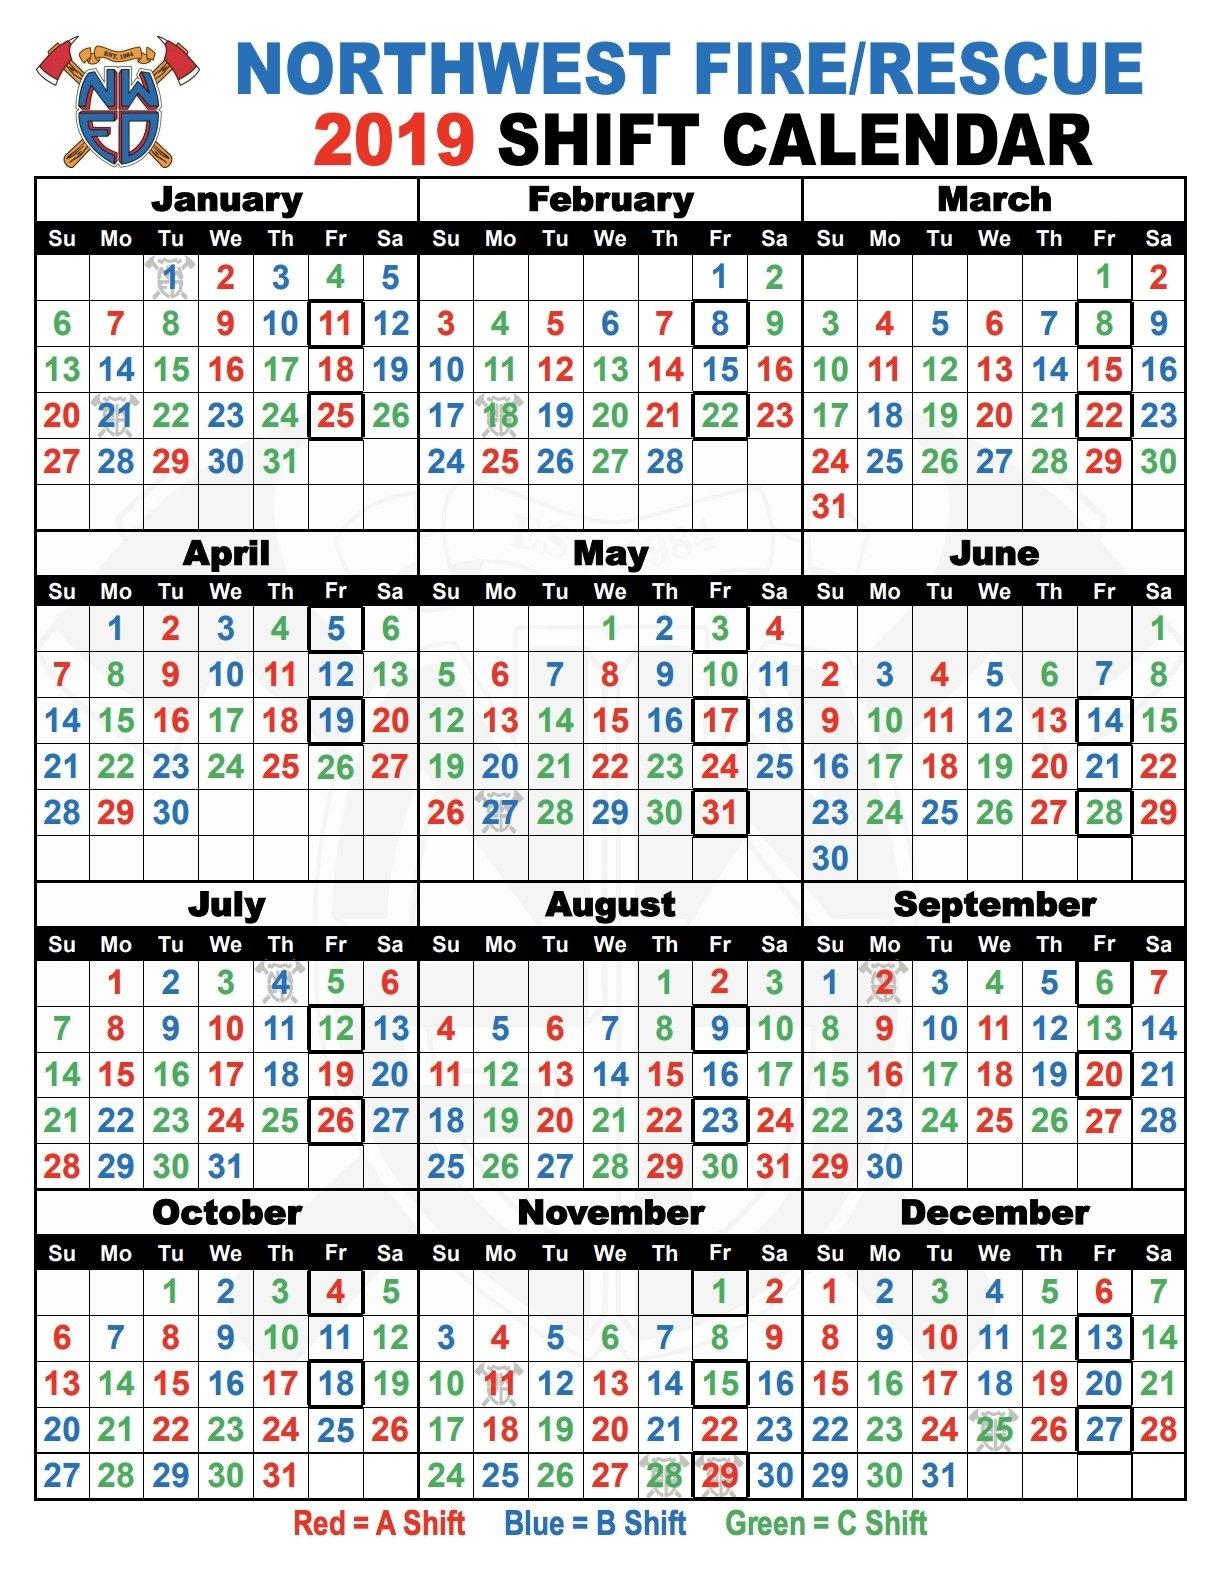 Shift Schedules | Northwest Fire District 3 Shift Calendar 2019